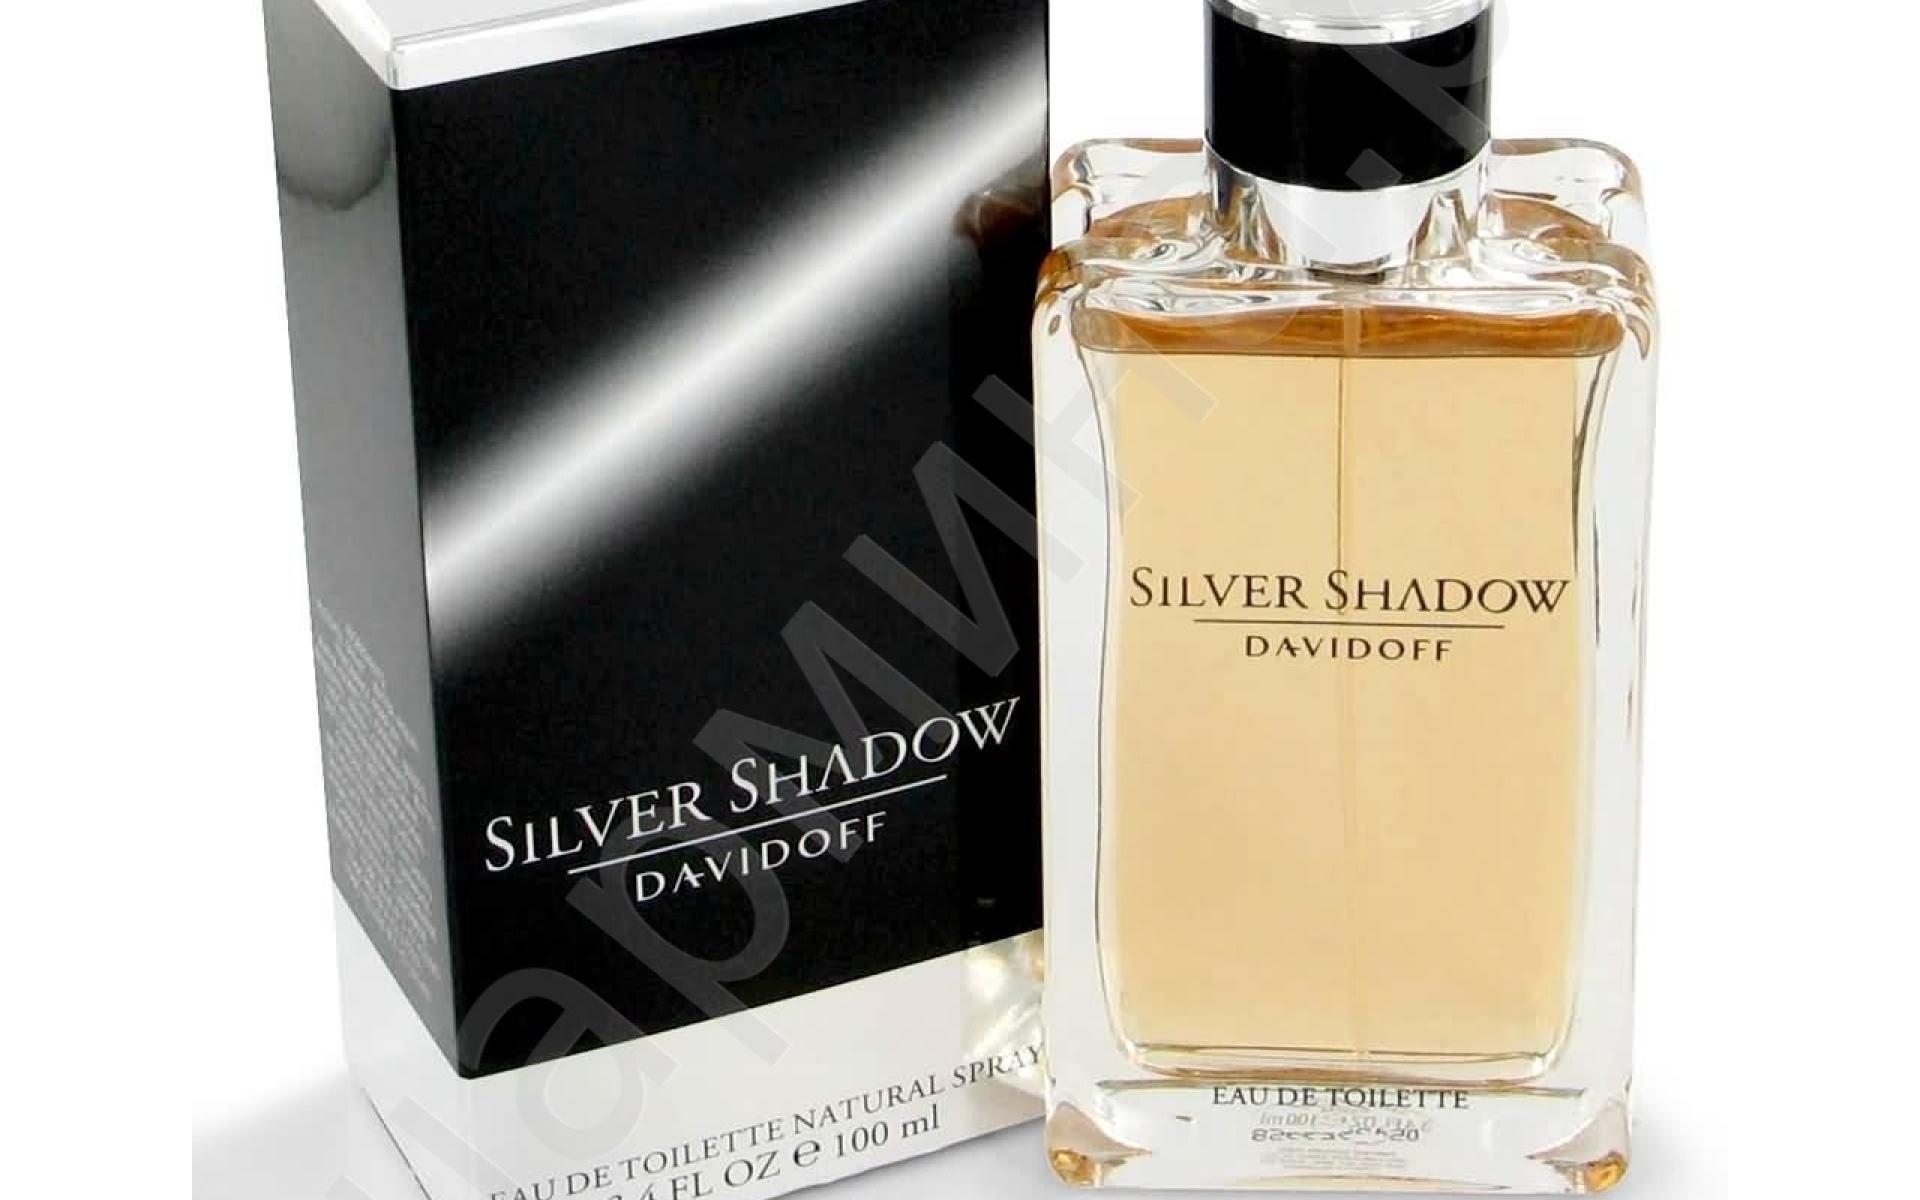 Картинки Davidoff, серебряная тень, парфюм, аромат фото и обои на рабочий стол